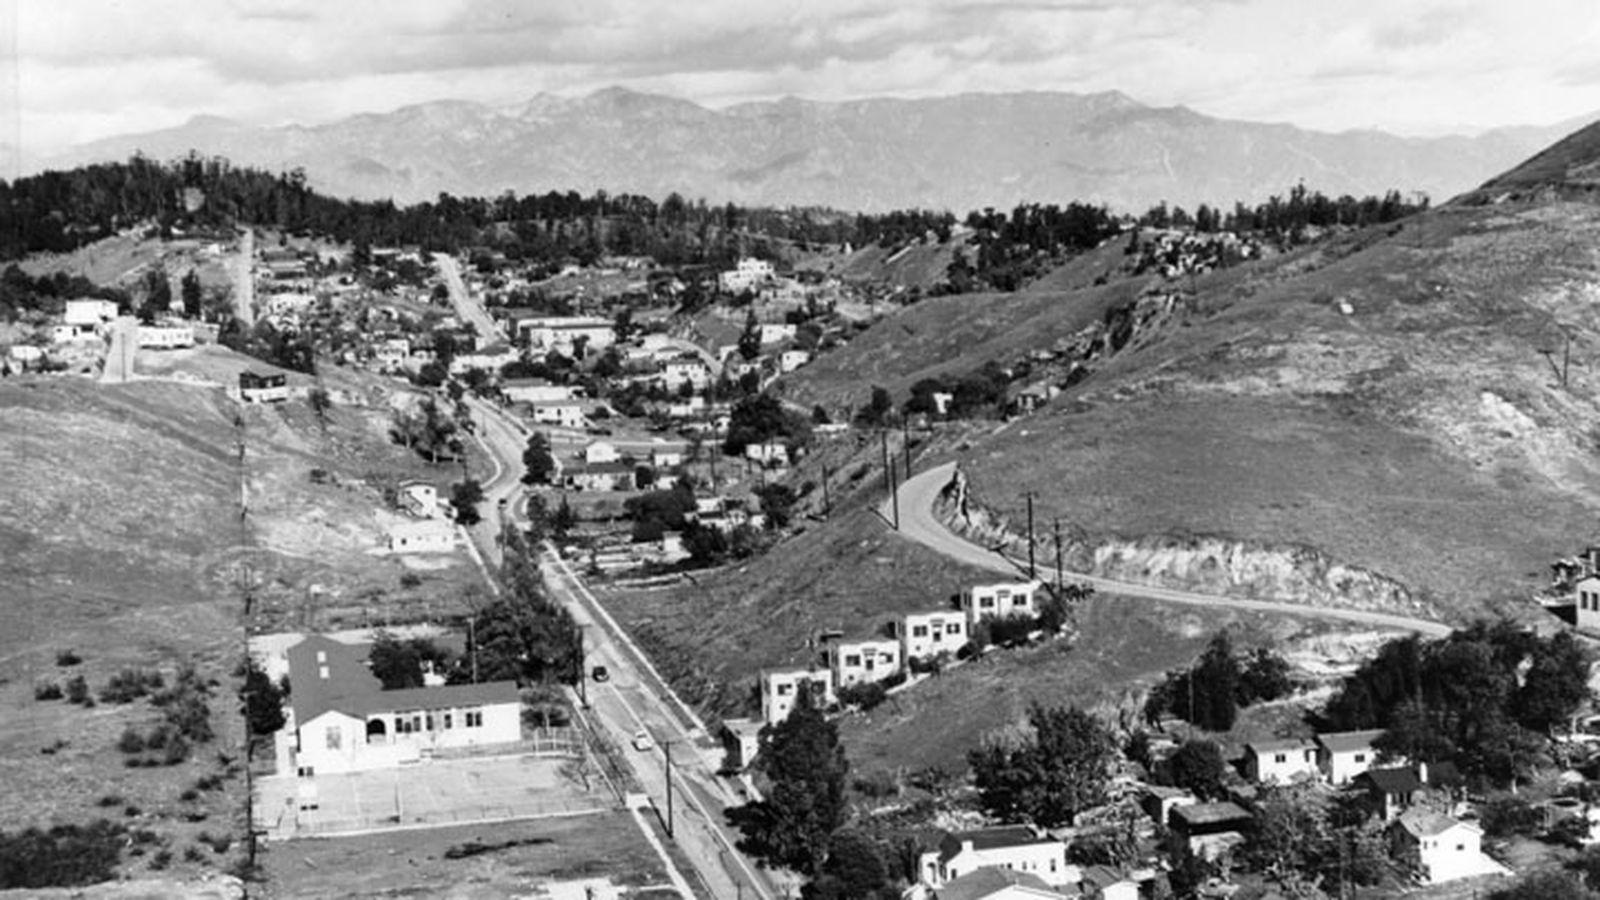 Elysian Park before Dodger Stadium: A history